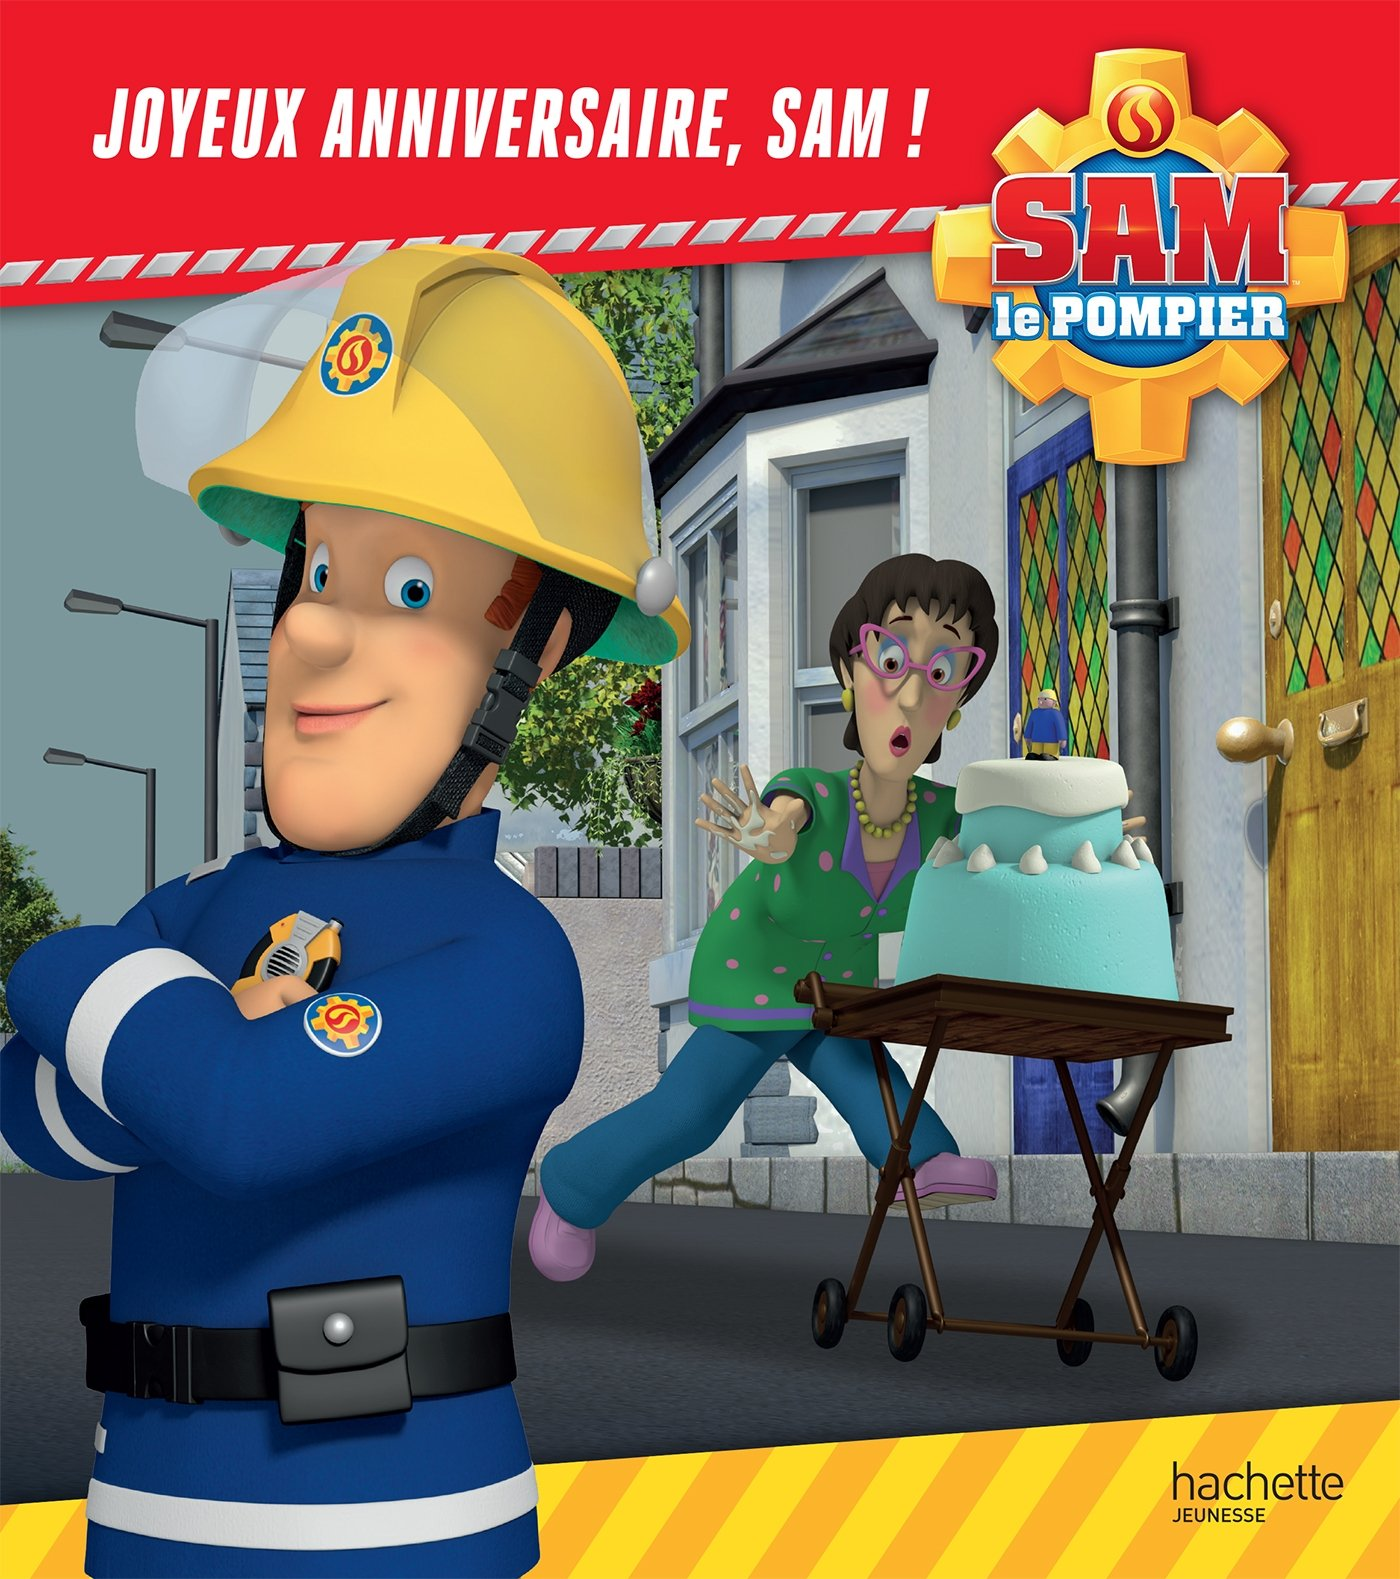 Sam Le Pompier Joyeux Anniversaire Sam French Edition 9782012043985 Amazon Com Books